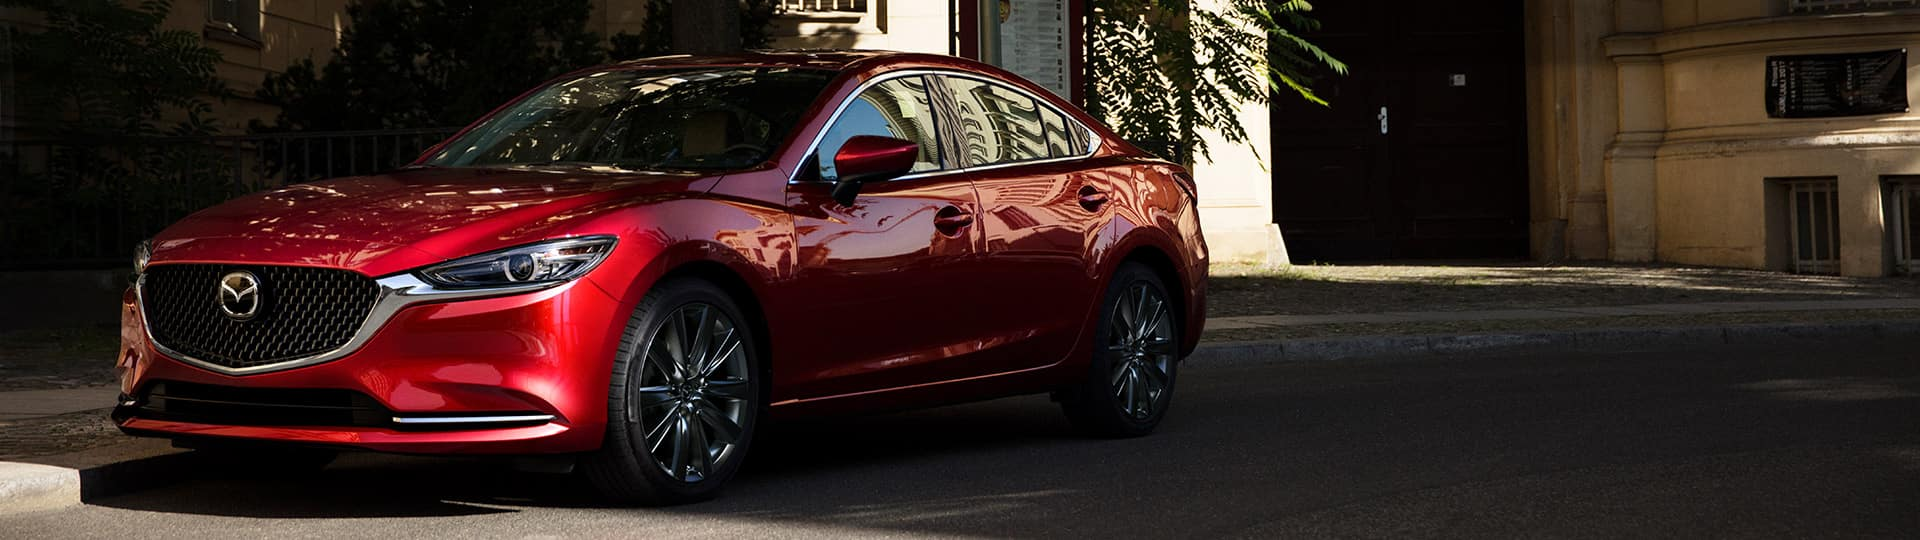 2018 Mazda6 red model parked